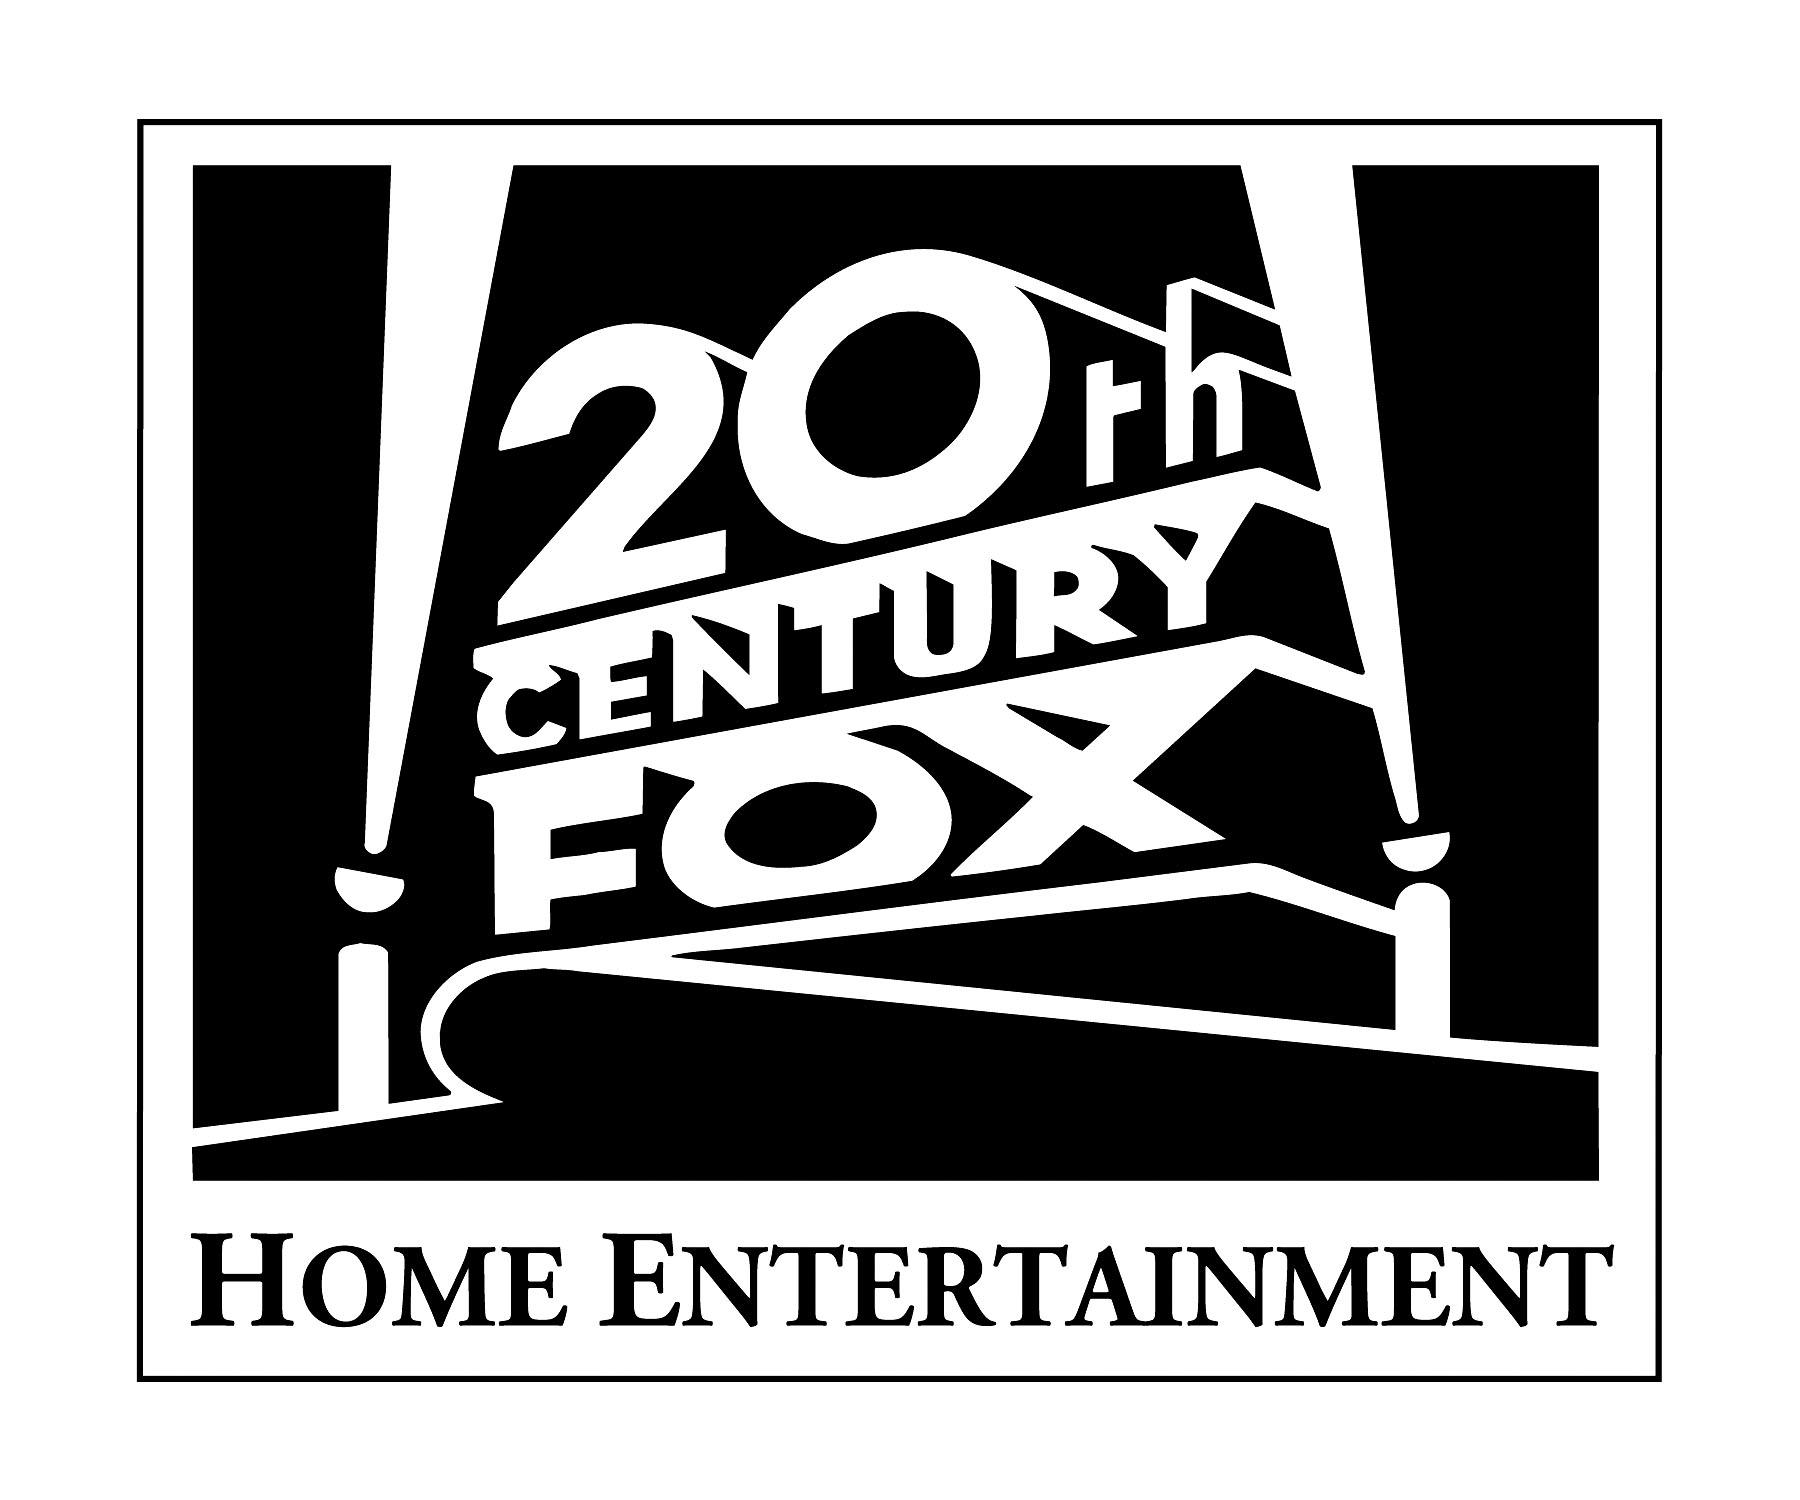 Major G Television Century 20th Fox